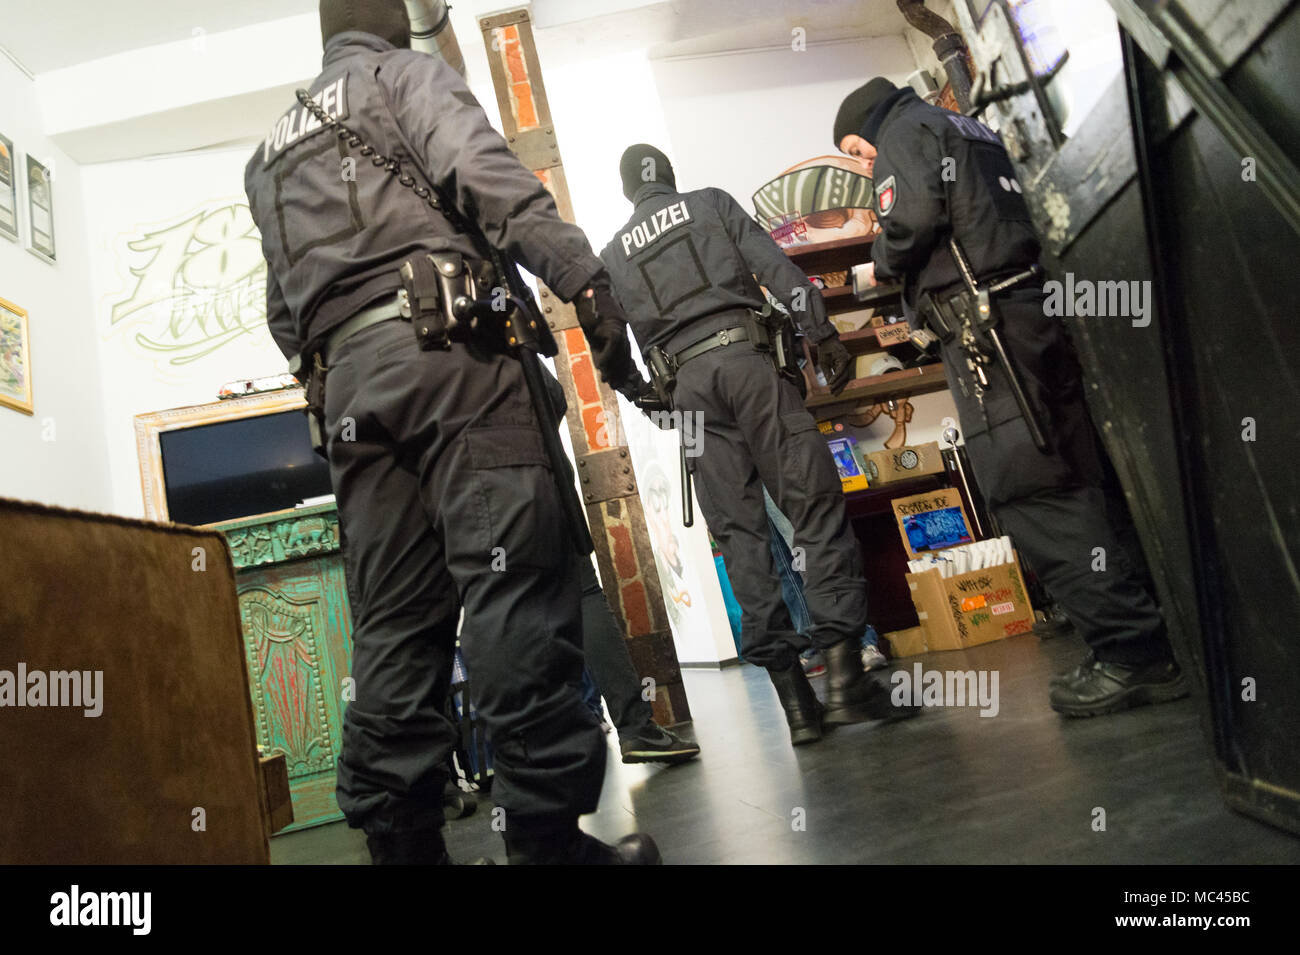 187 Strassenbande Shop